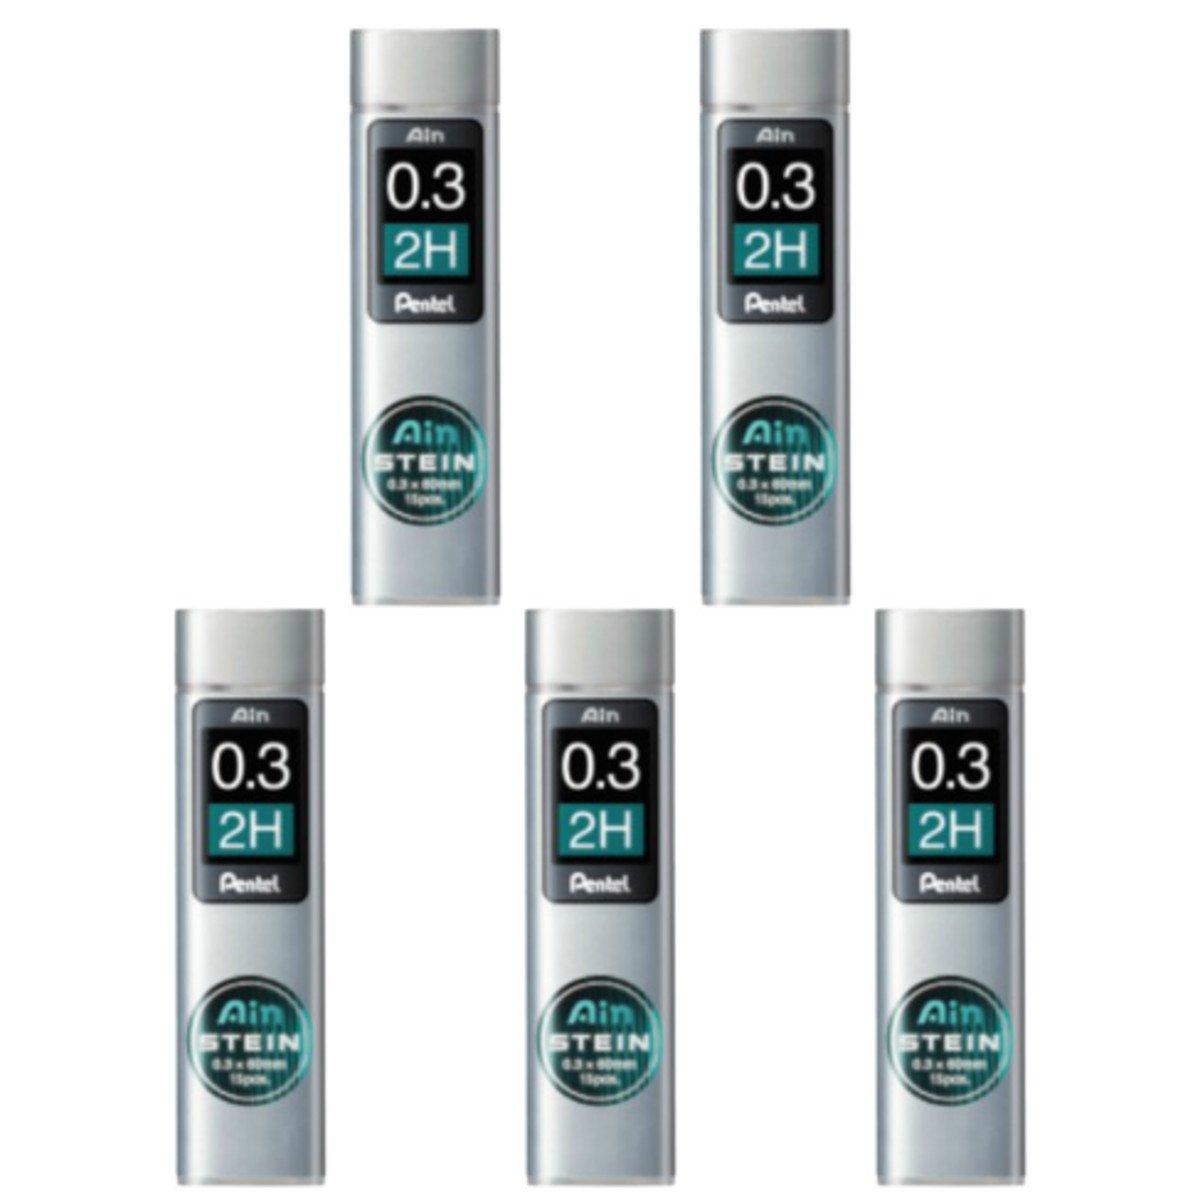 Pentel Ain Mechanical Pencil Leads 0.3mm 2H, 5 Pack/total 75 Leads Value Set